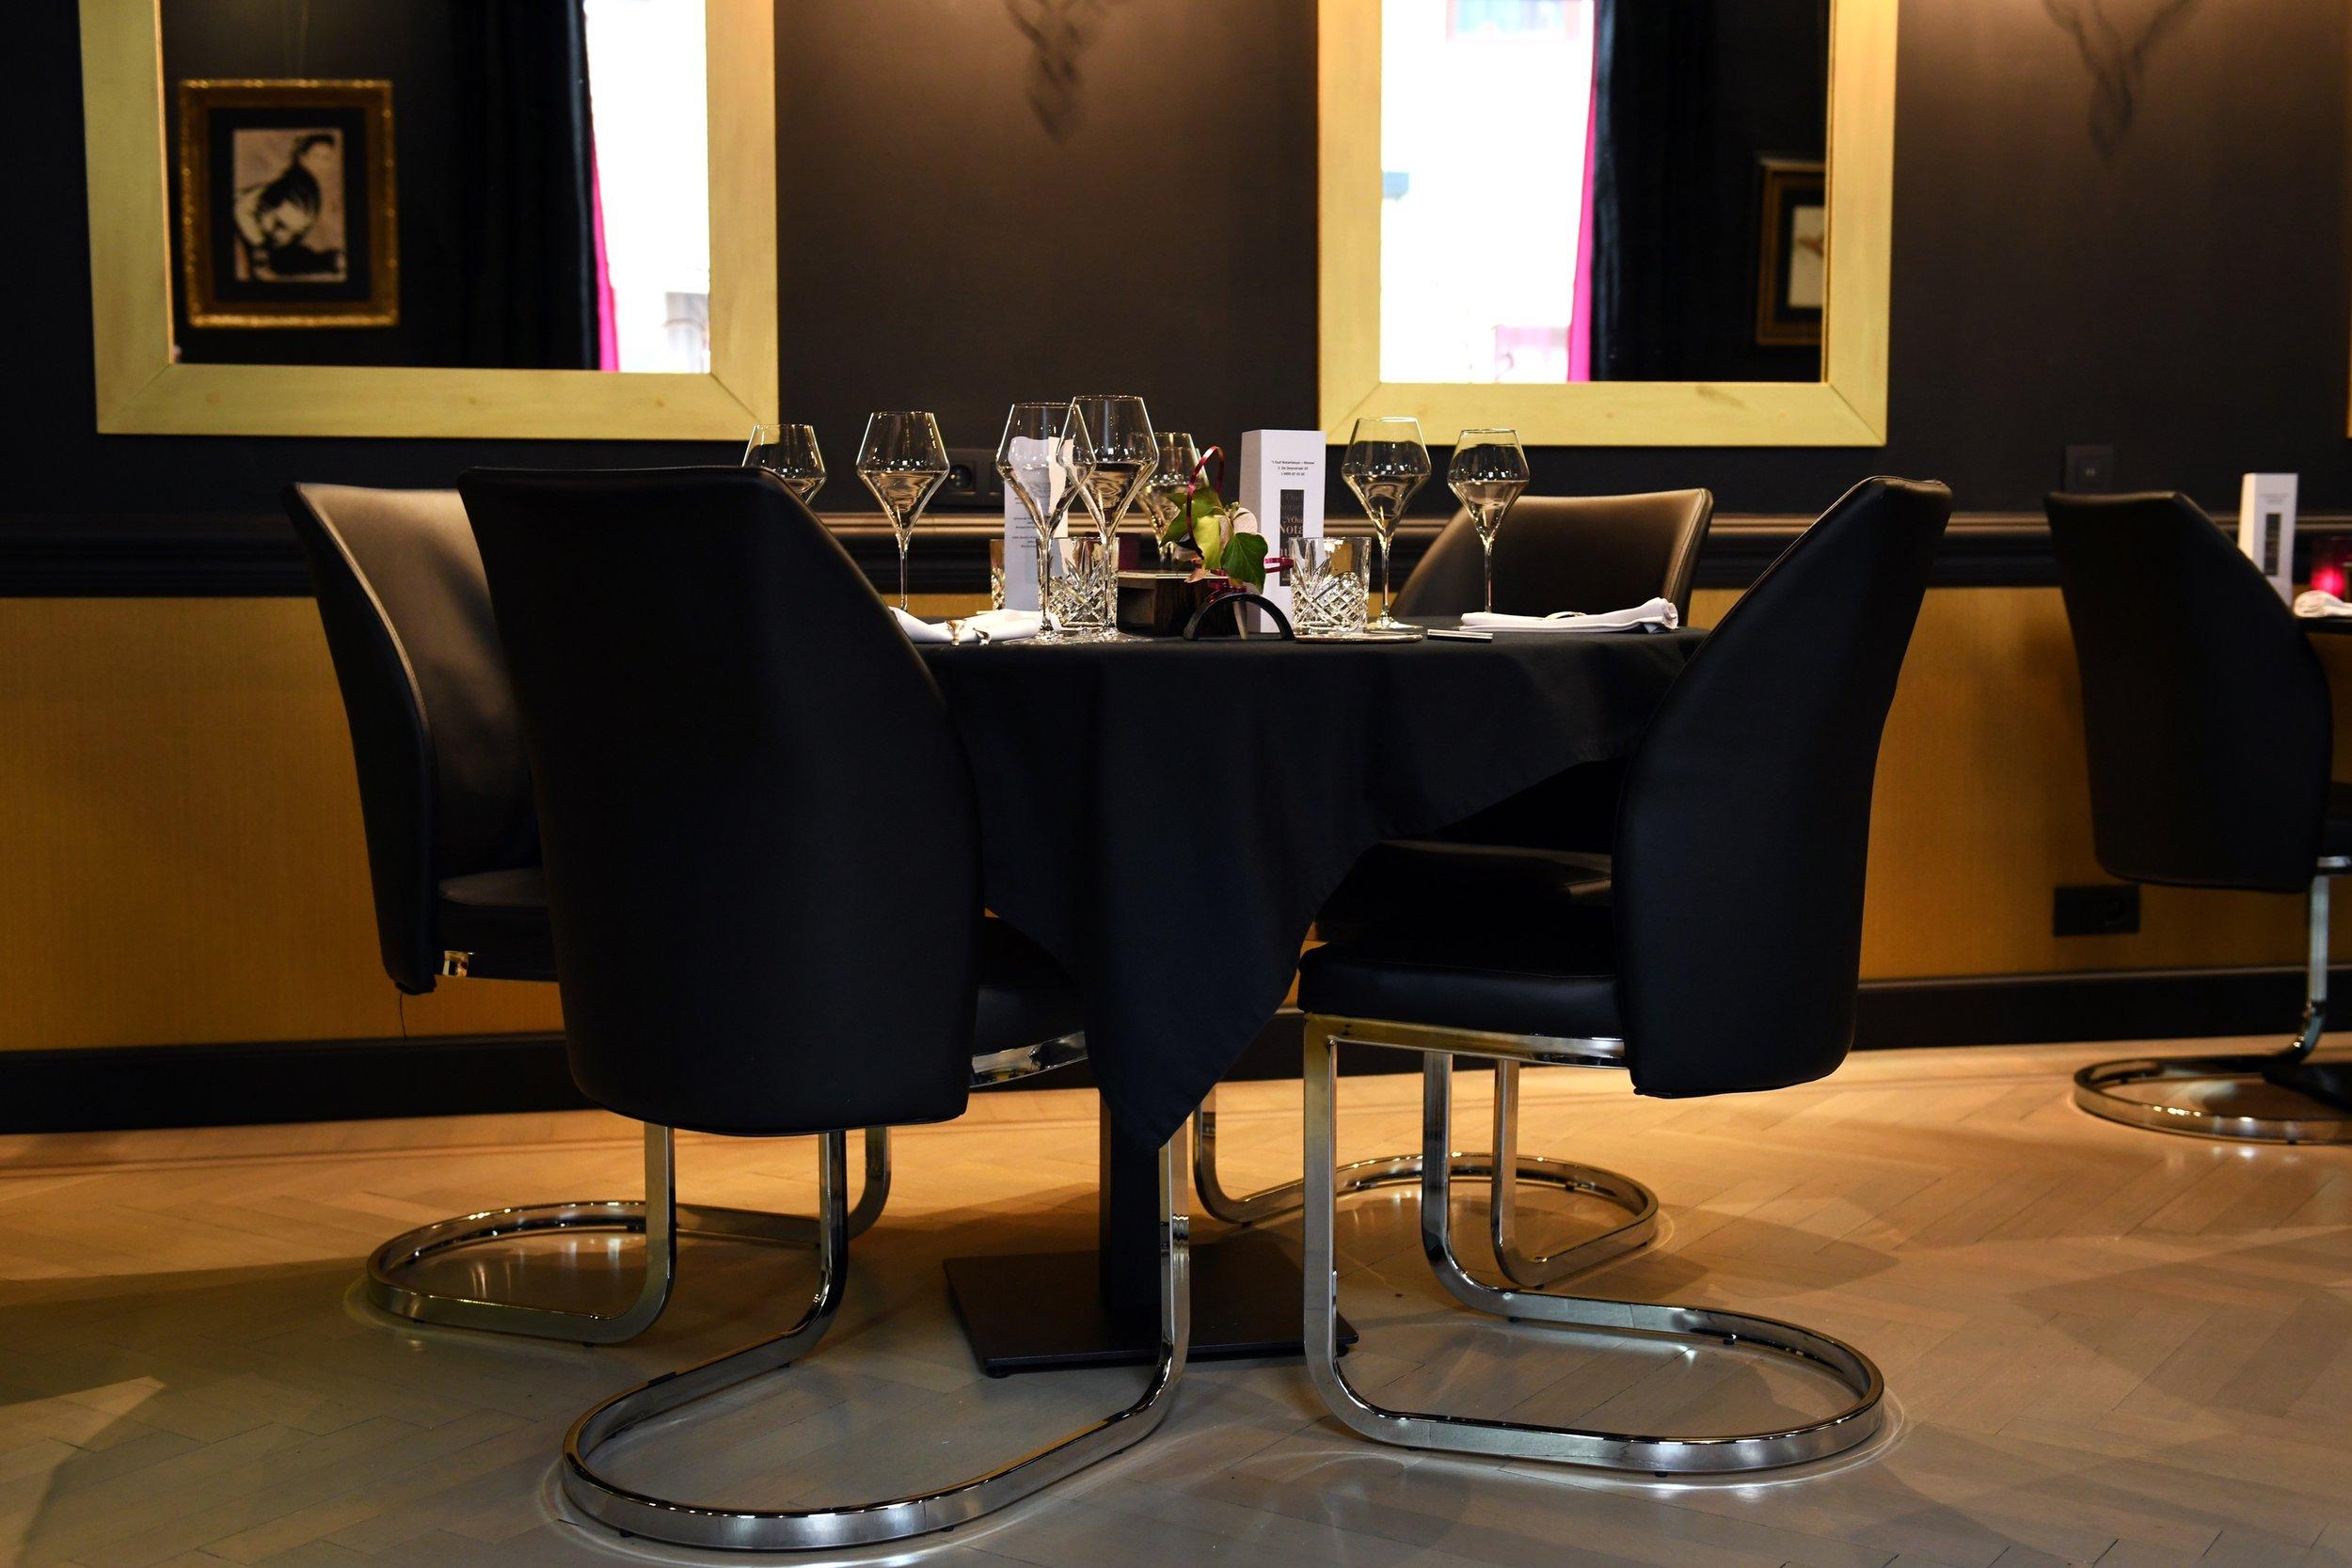 2 restaurant brasserie oud notarishuis ninove bart albrecht tablefever .jpg